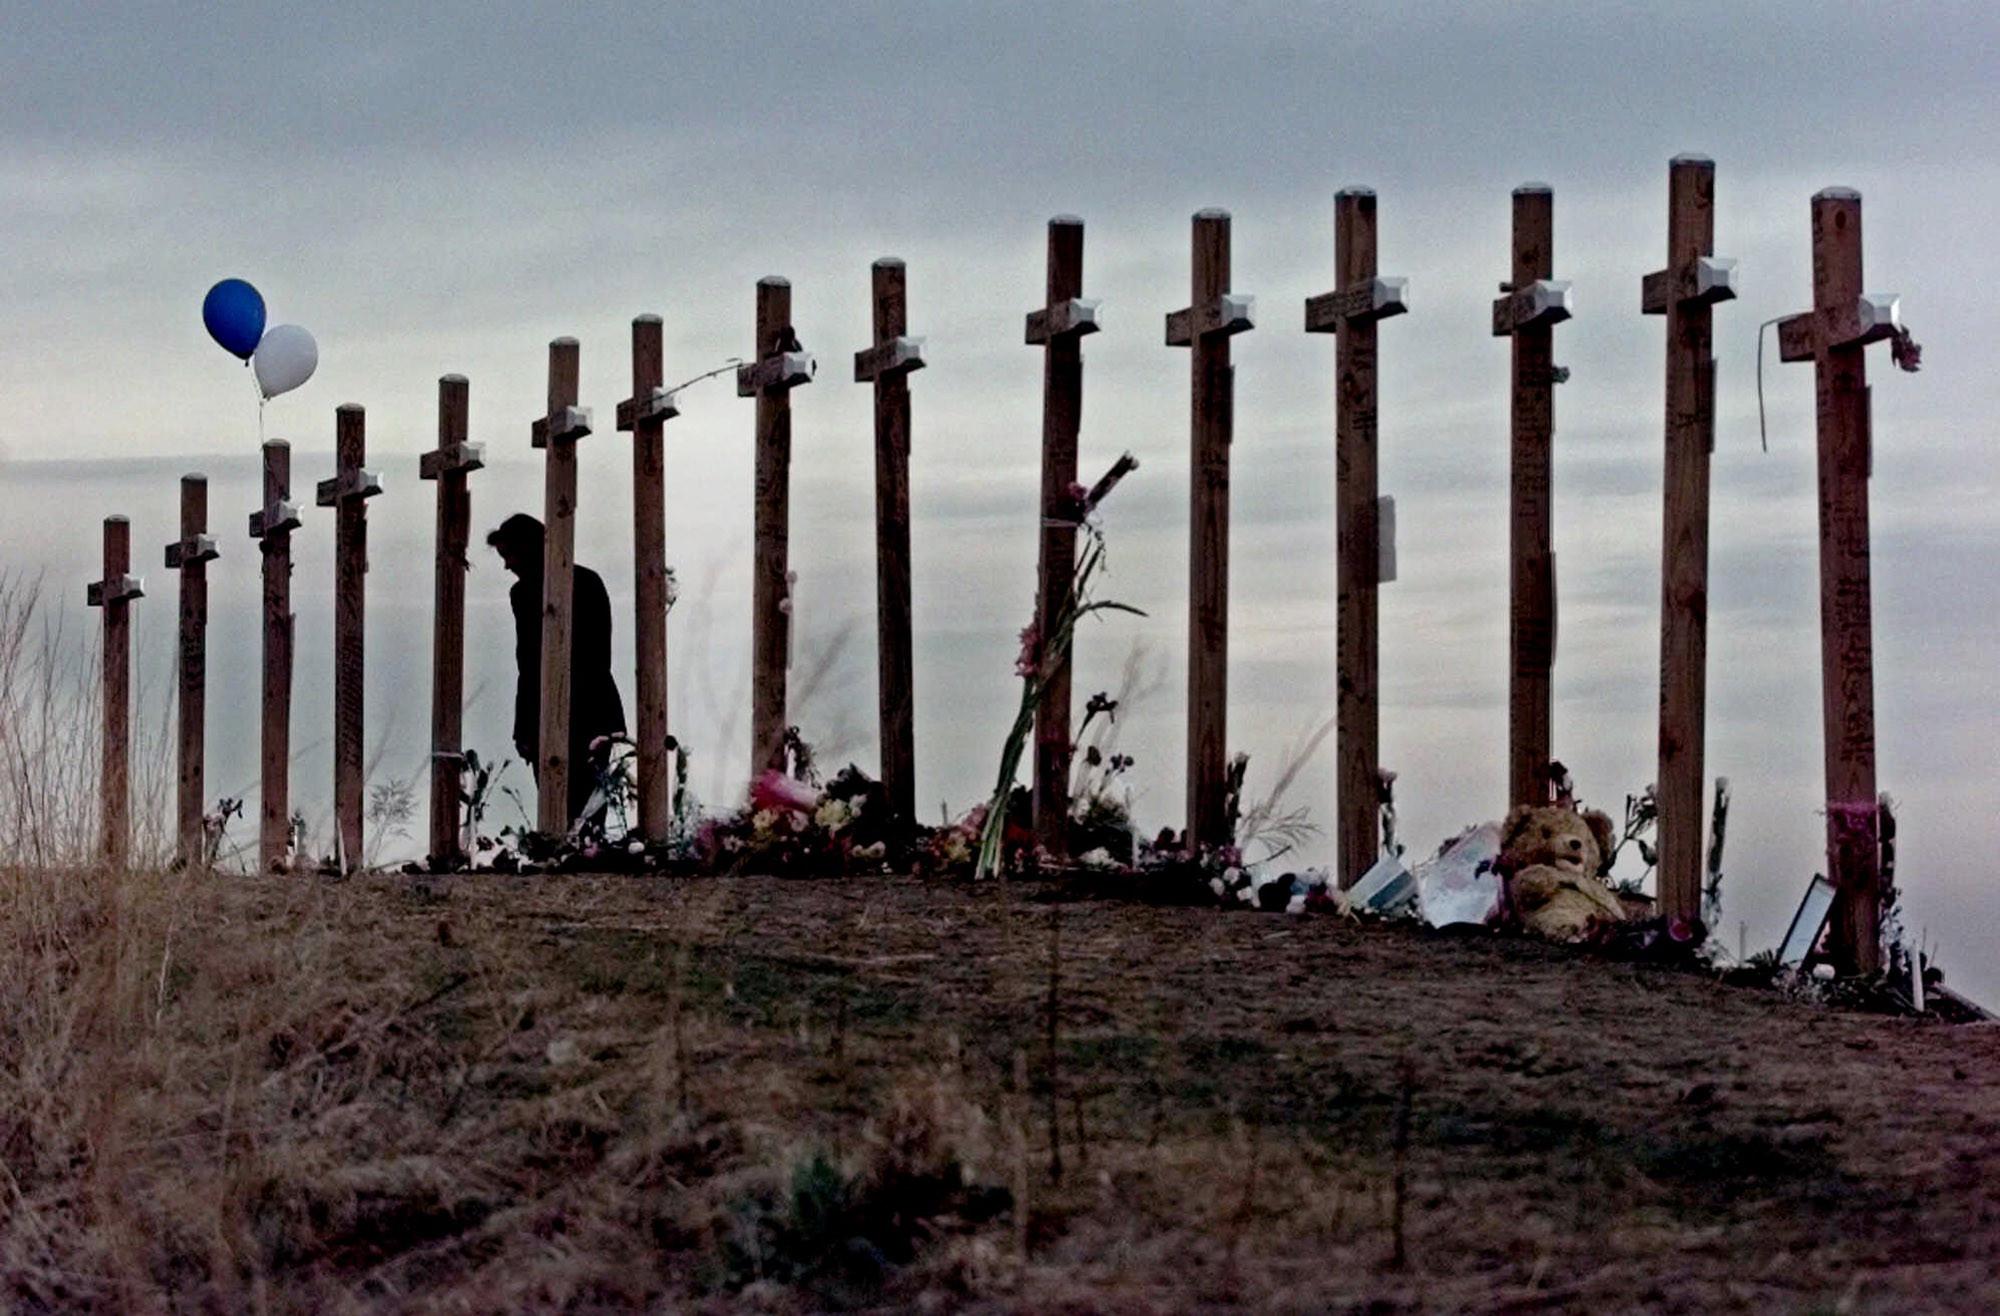 The 15 Columbine Shooting memorial crosses. via www.thenypost.files.wordpress.com